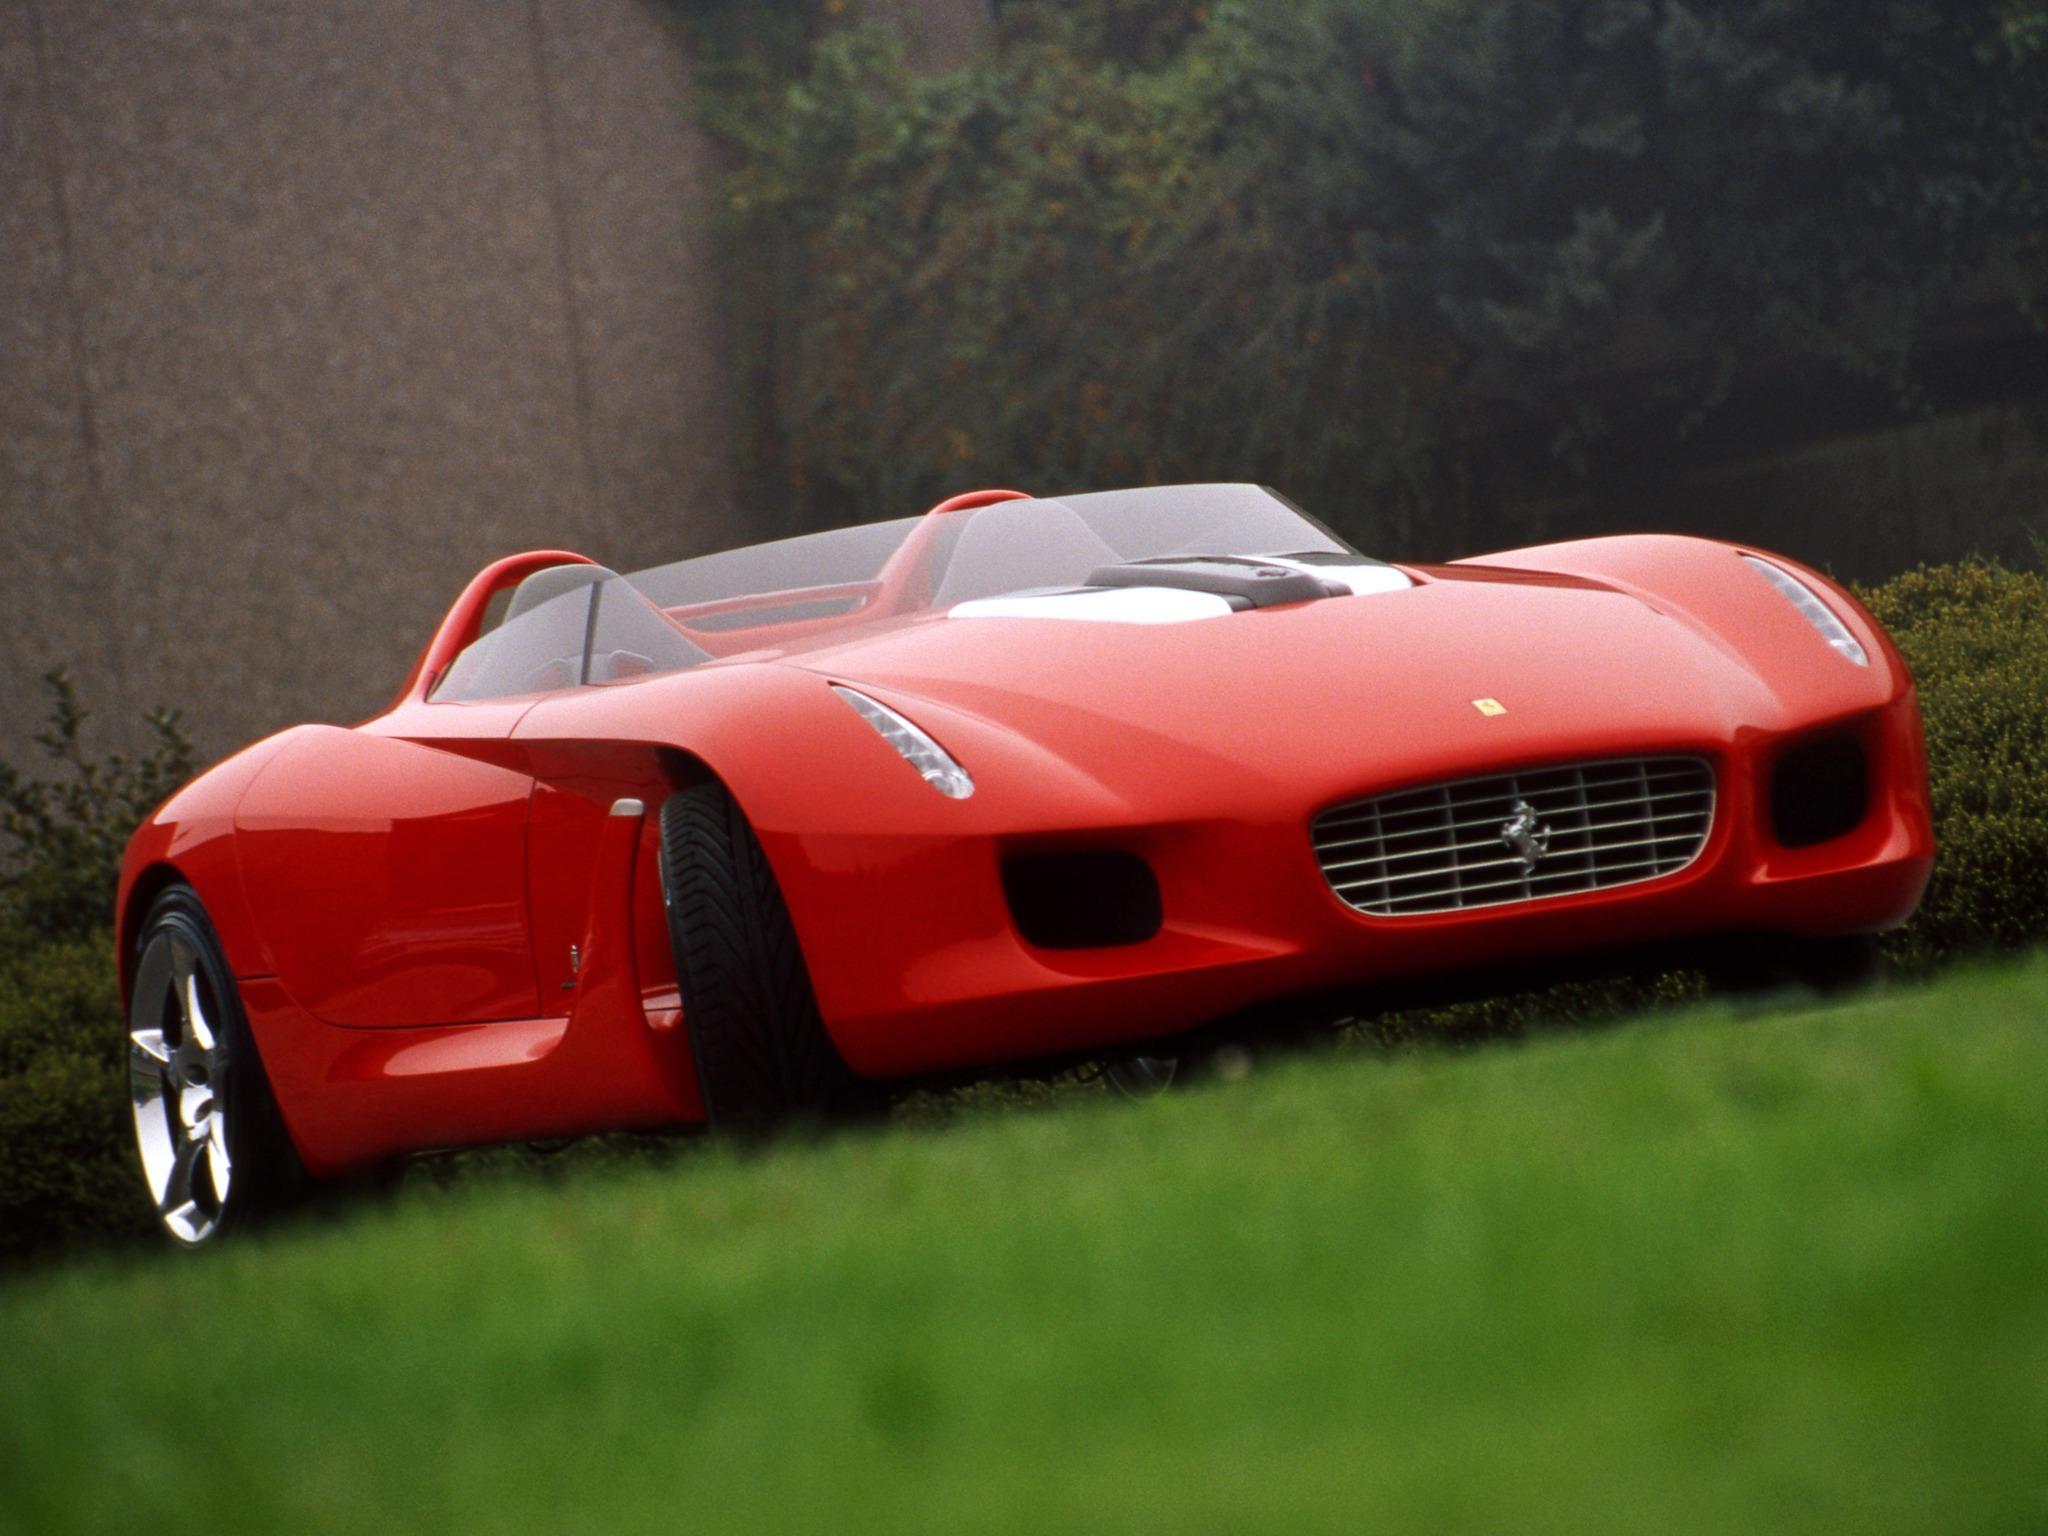 Ferrari_rossa_1 Ferrari_rossa_2 Ferrari_rossa_3 Ferrari_rossa_4  Ferrari_rossa_5 Ferrari_rossa_6 Ferrari_rossa_7 Ferrari_rossa_8  Ferrari_rossa_9 ...